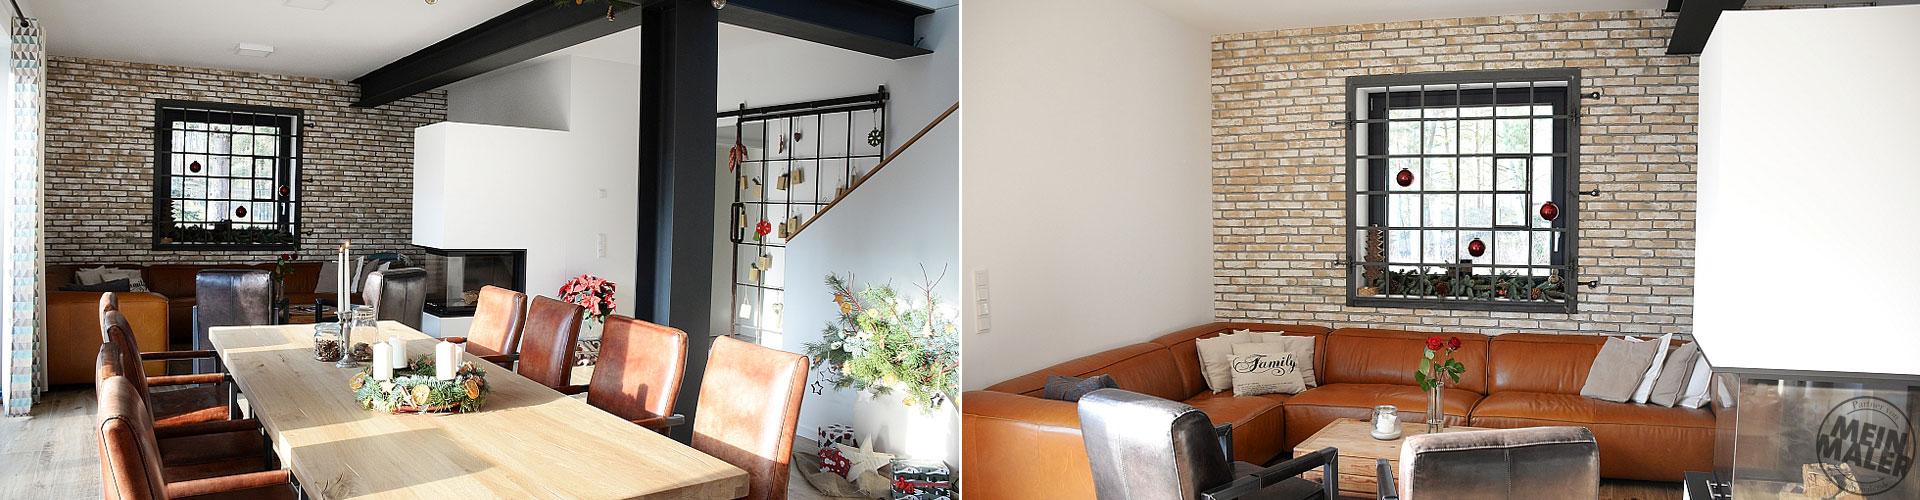 Wohnträume / Lifestyle / Loftdesign